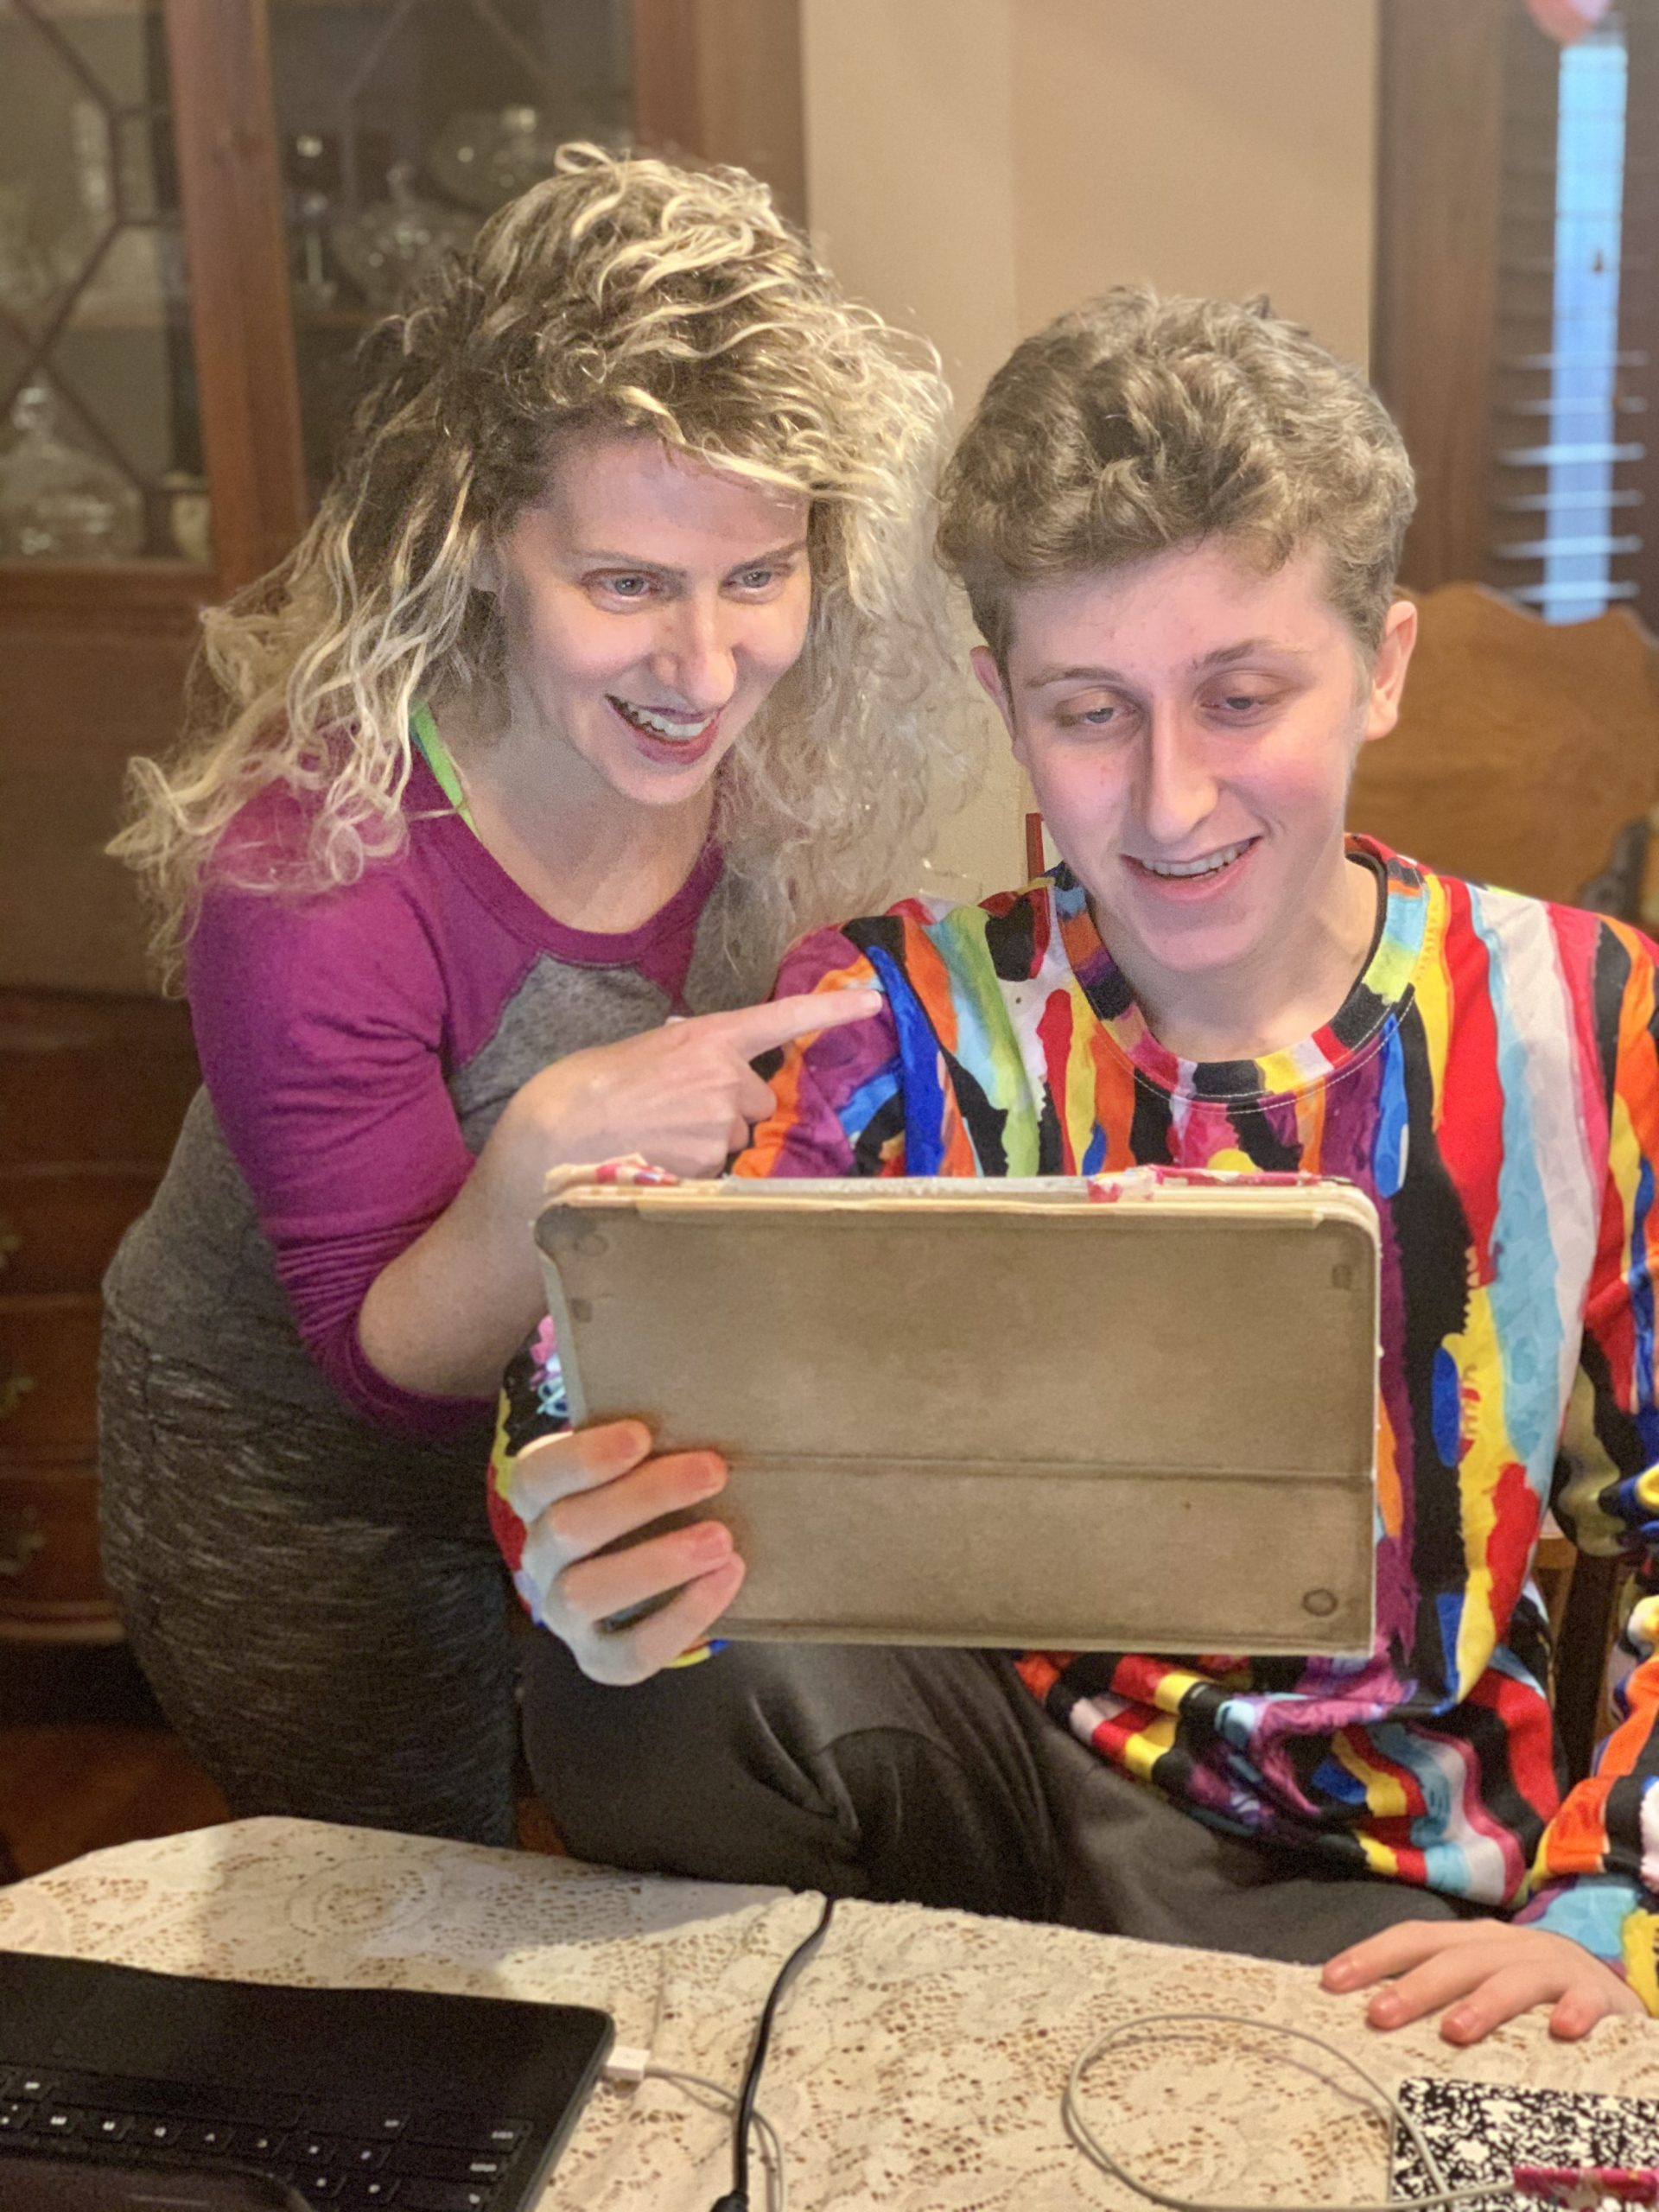 How Verizon Helps Keep My Family ConnectedDuring this Unprecedented Holiday Season